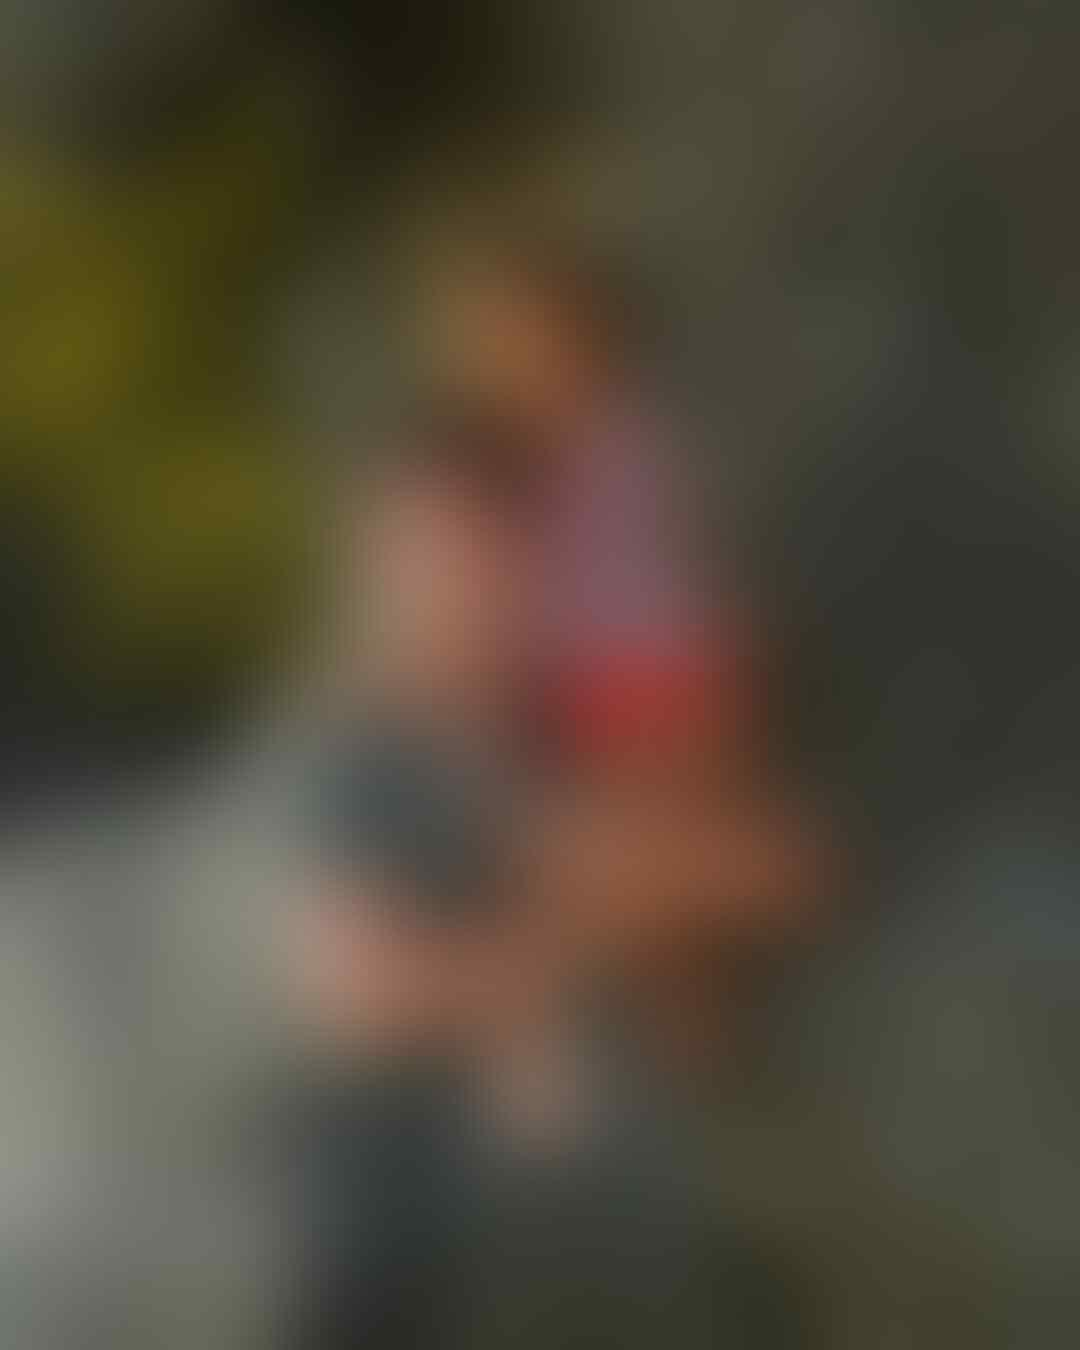 10 Pesona Memikat Hati Richard Kyle, Teman Dekat Jessica Iskandar